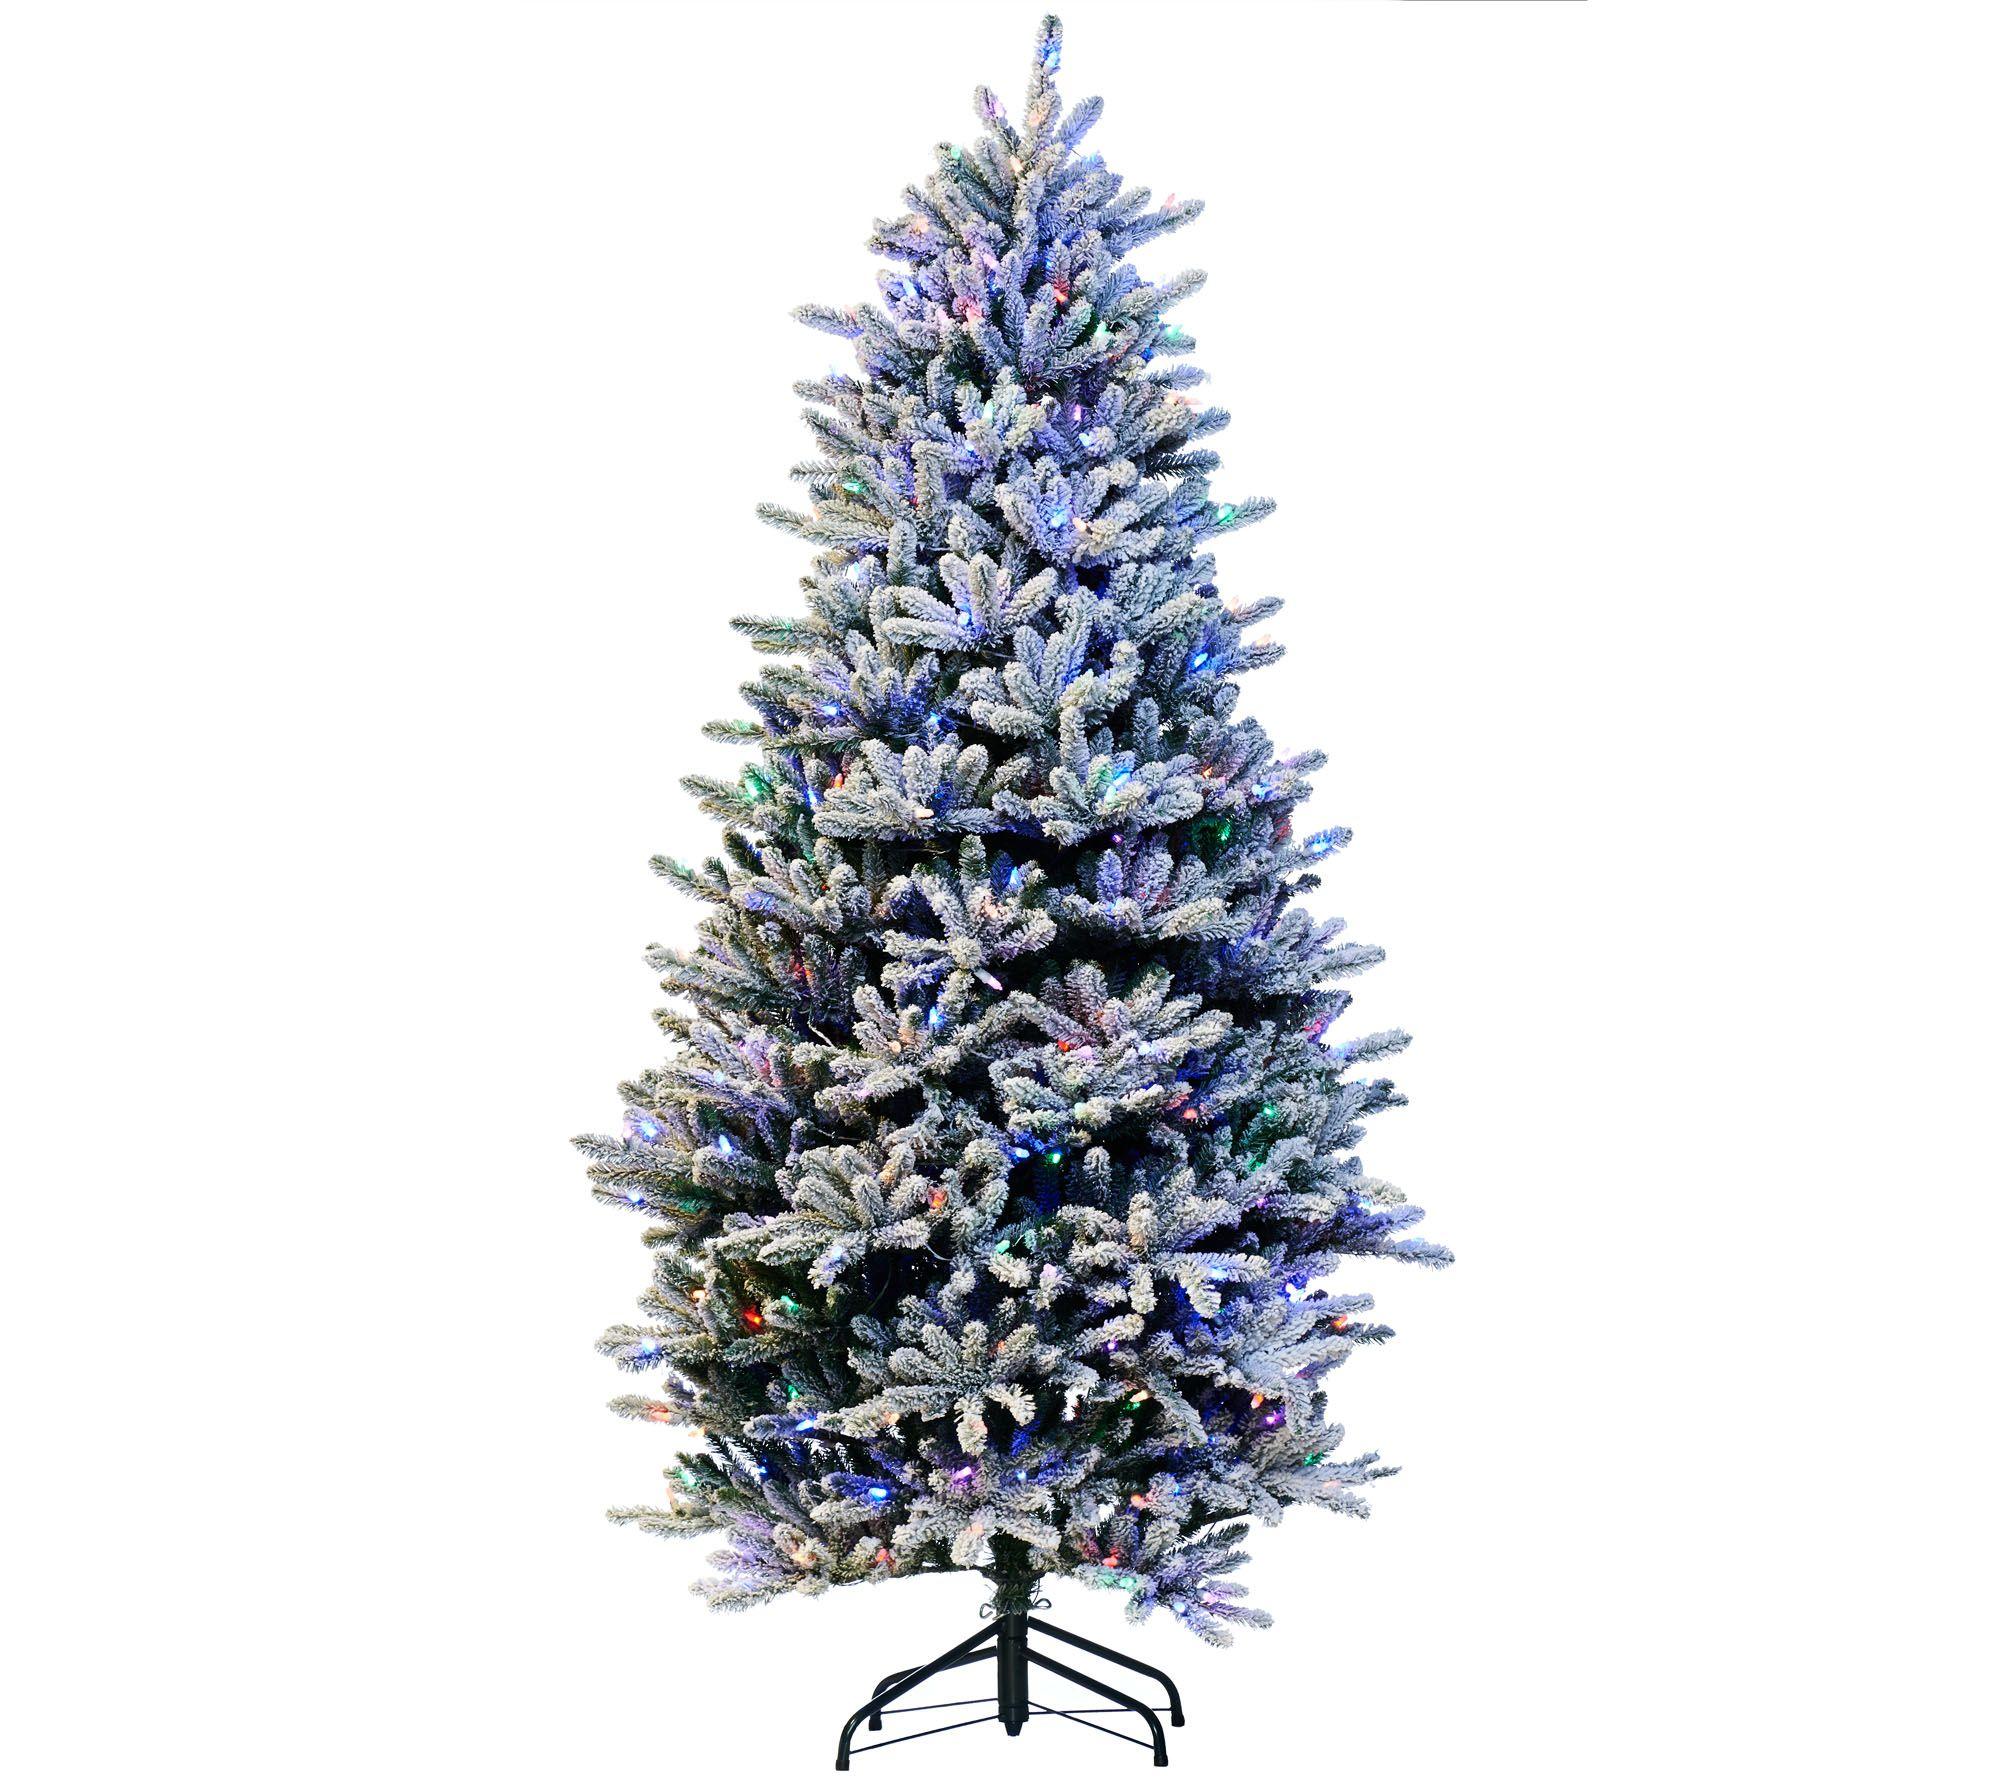 santas best 75 rgb 20 flocked balsam fir christmas tree qvccom - Santas Best Christmas Trees